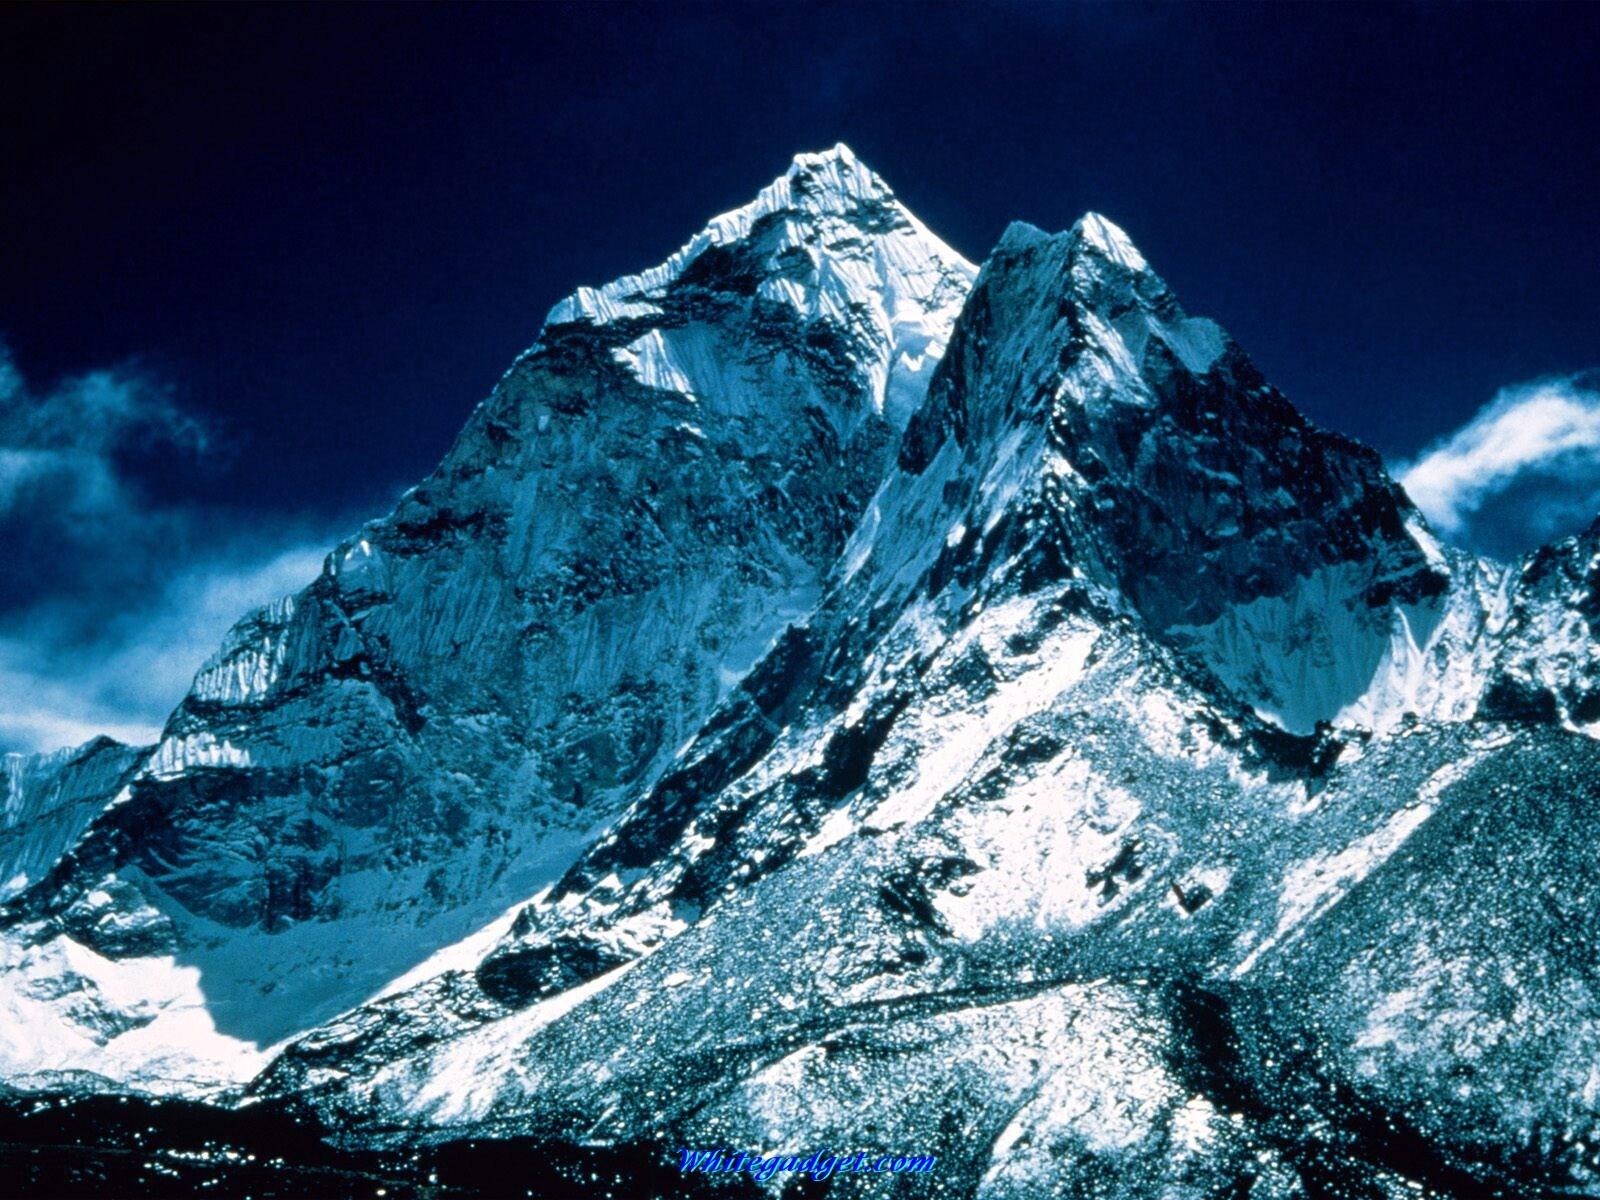 47 Snow Mountain Wallpaper Hd On Wallpapersafari